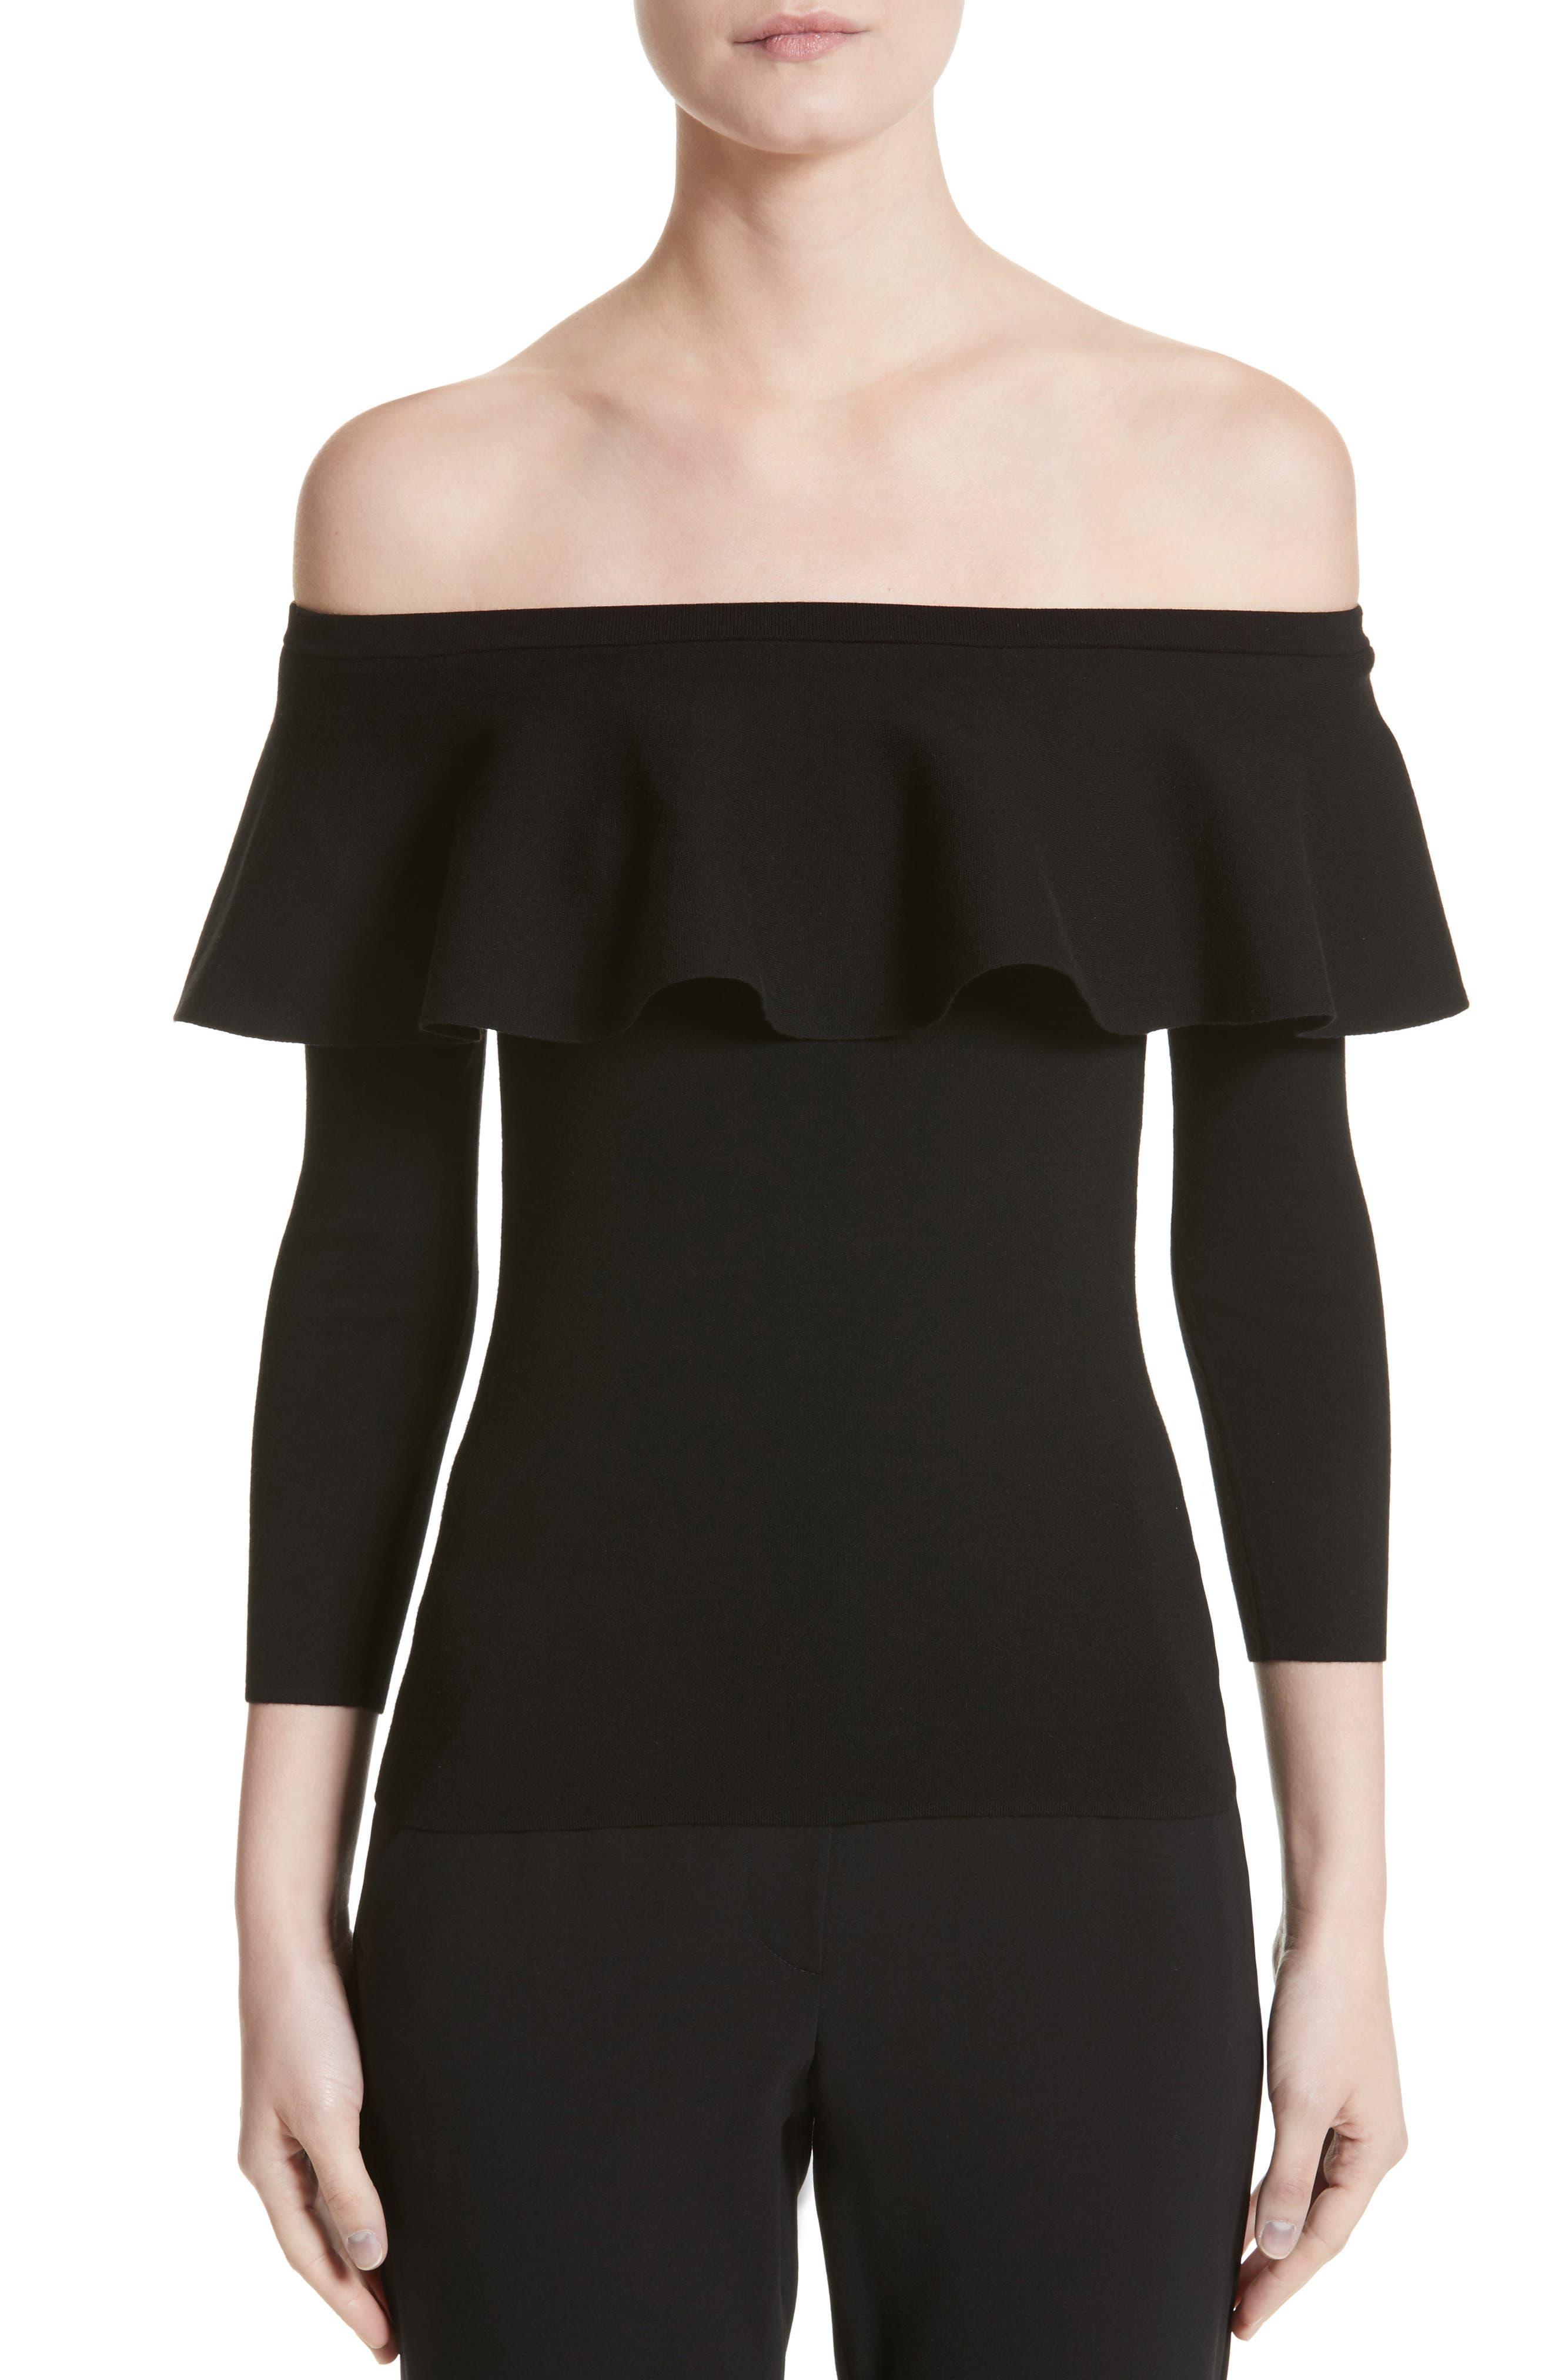 Alternate Image 1 Selected - Michael Kors Off the Shoulder Sweater